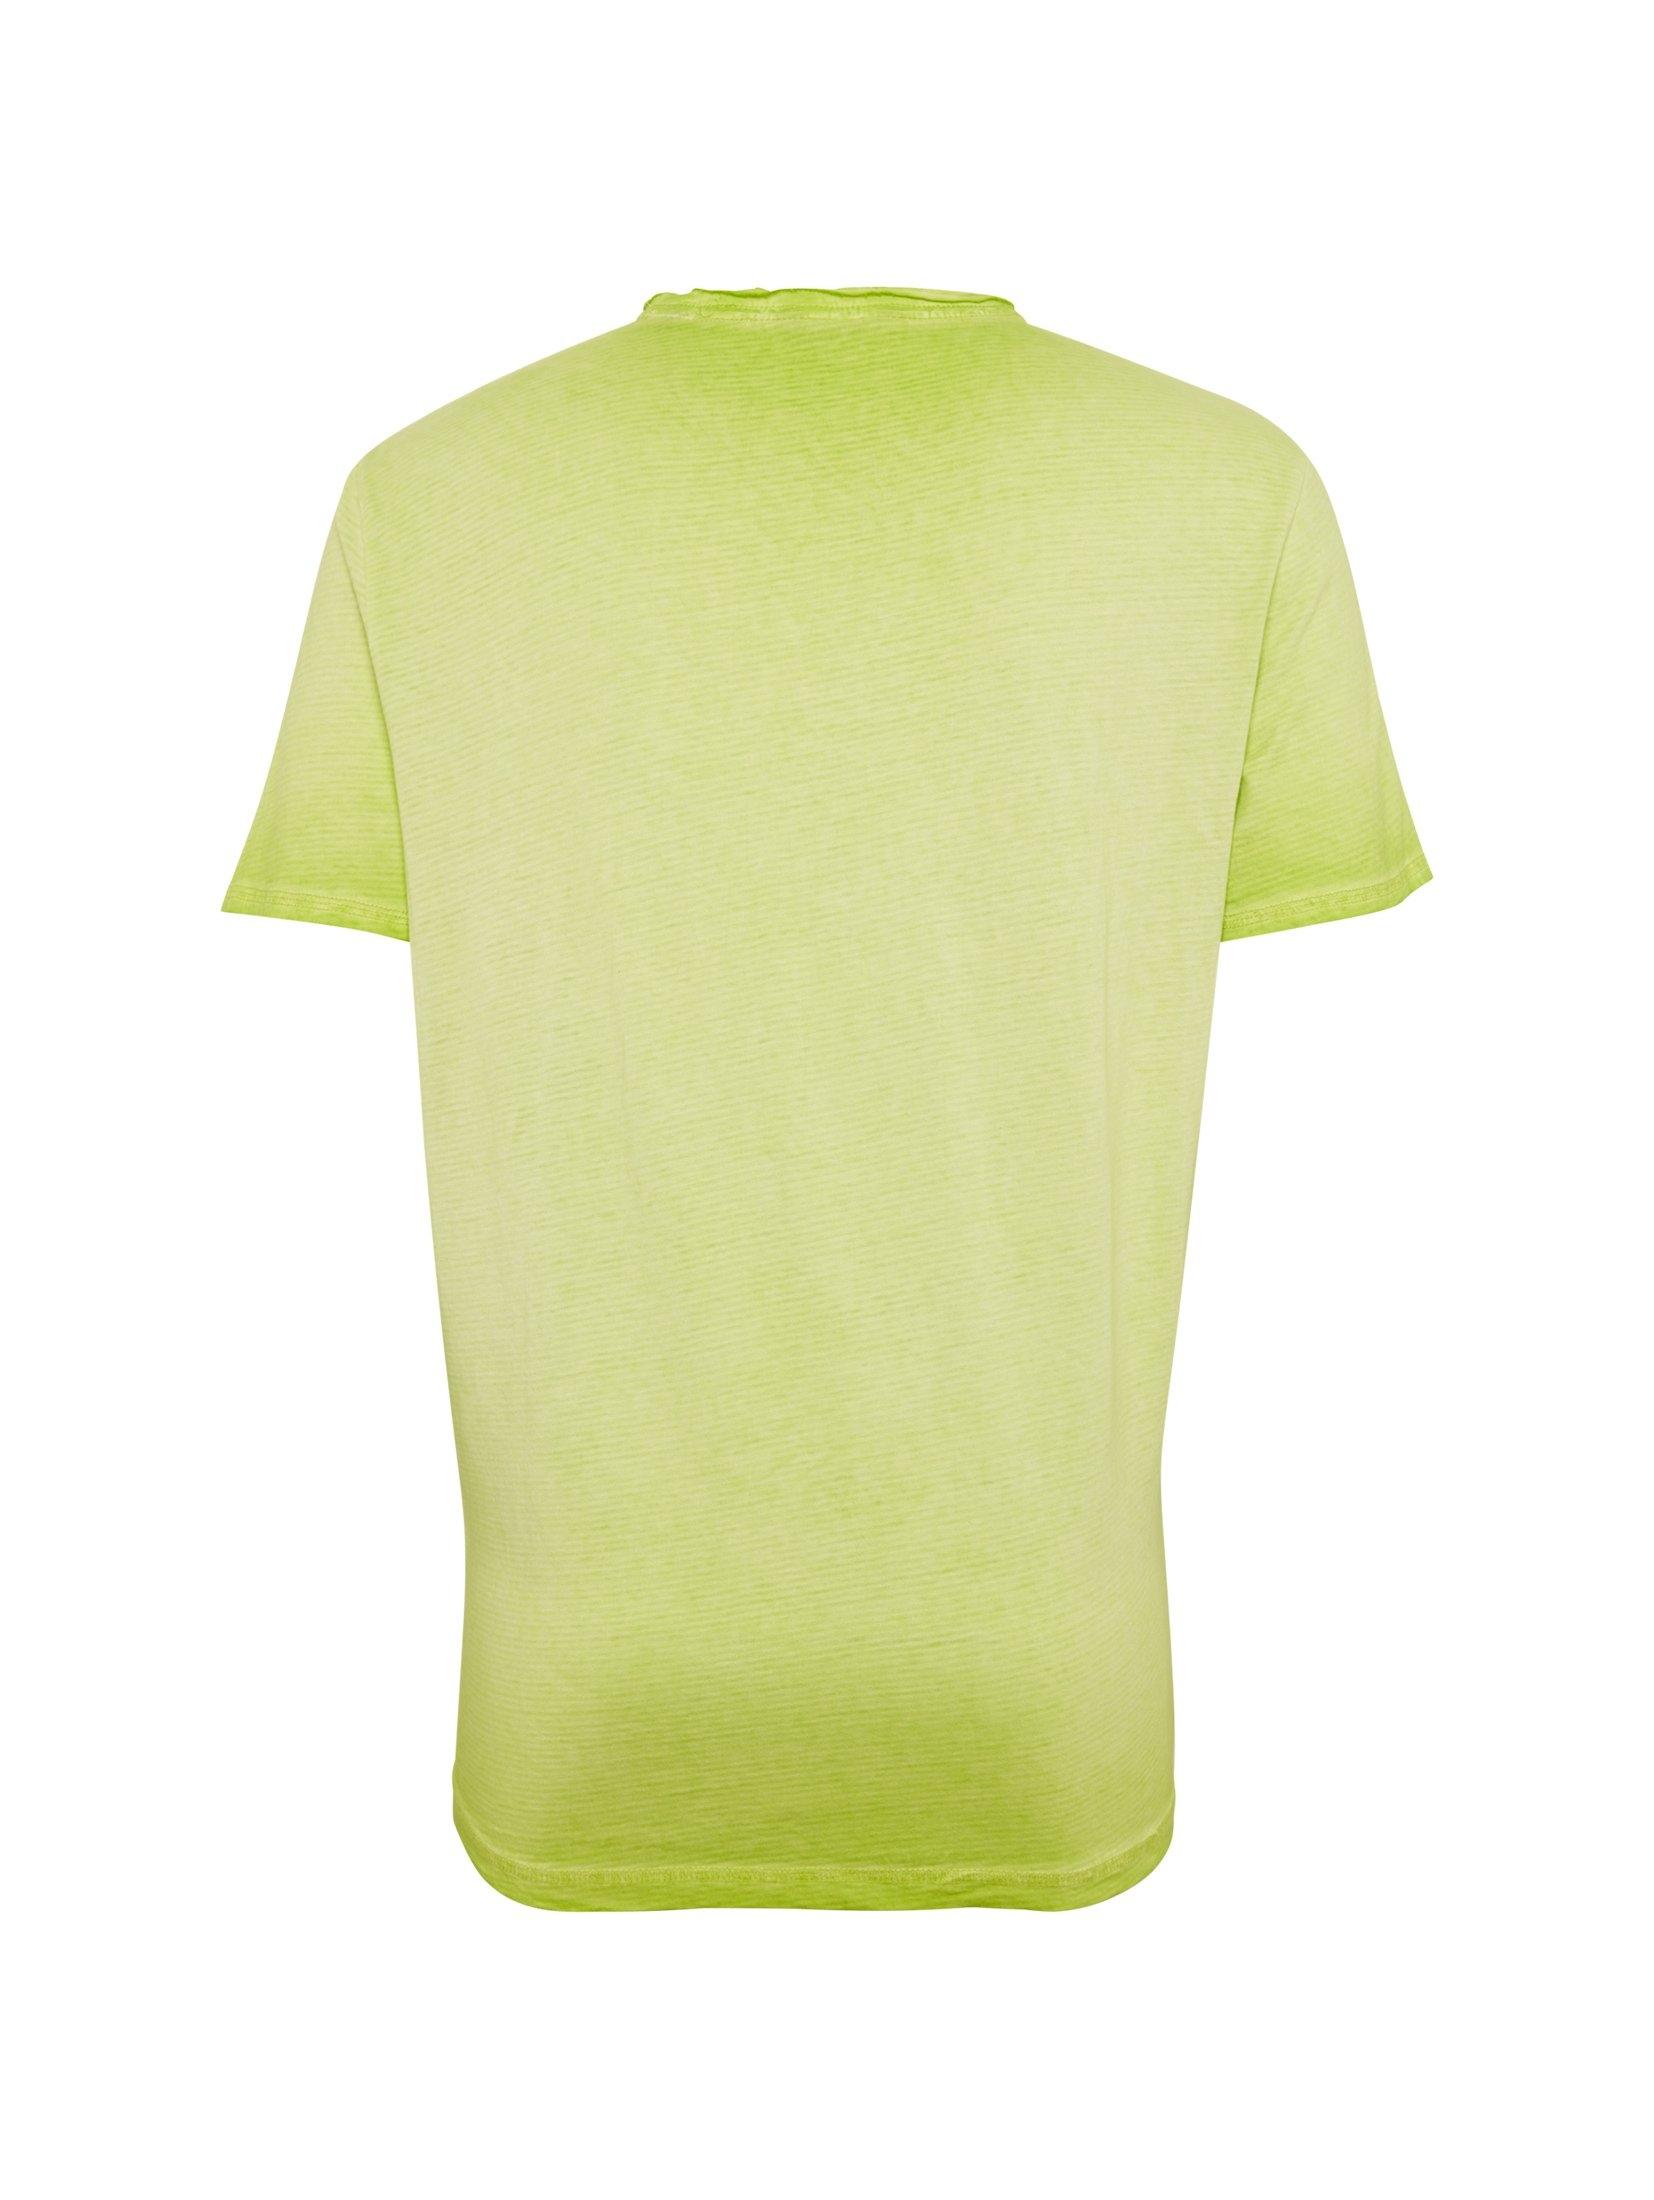 Tailor T Tom Bij Nu shirtt shirt Met LogoprintBestel K1lJTFuc3